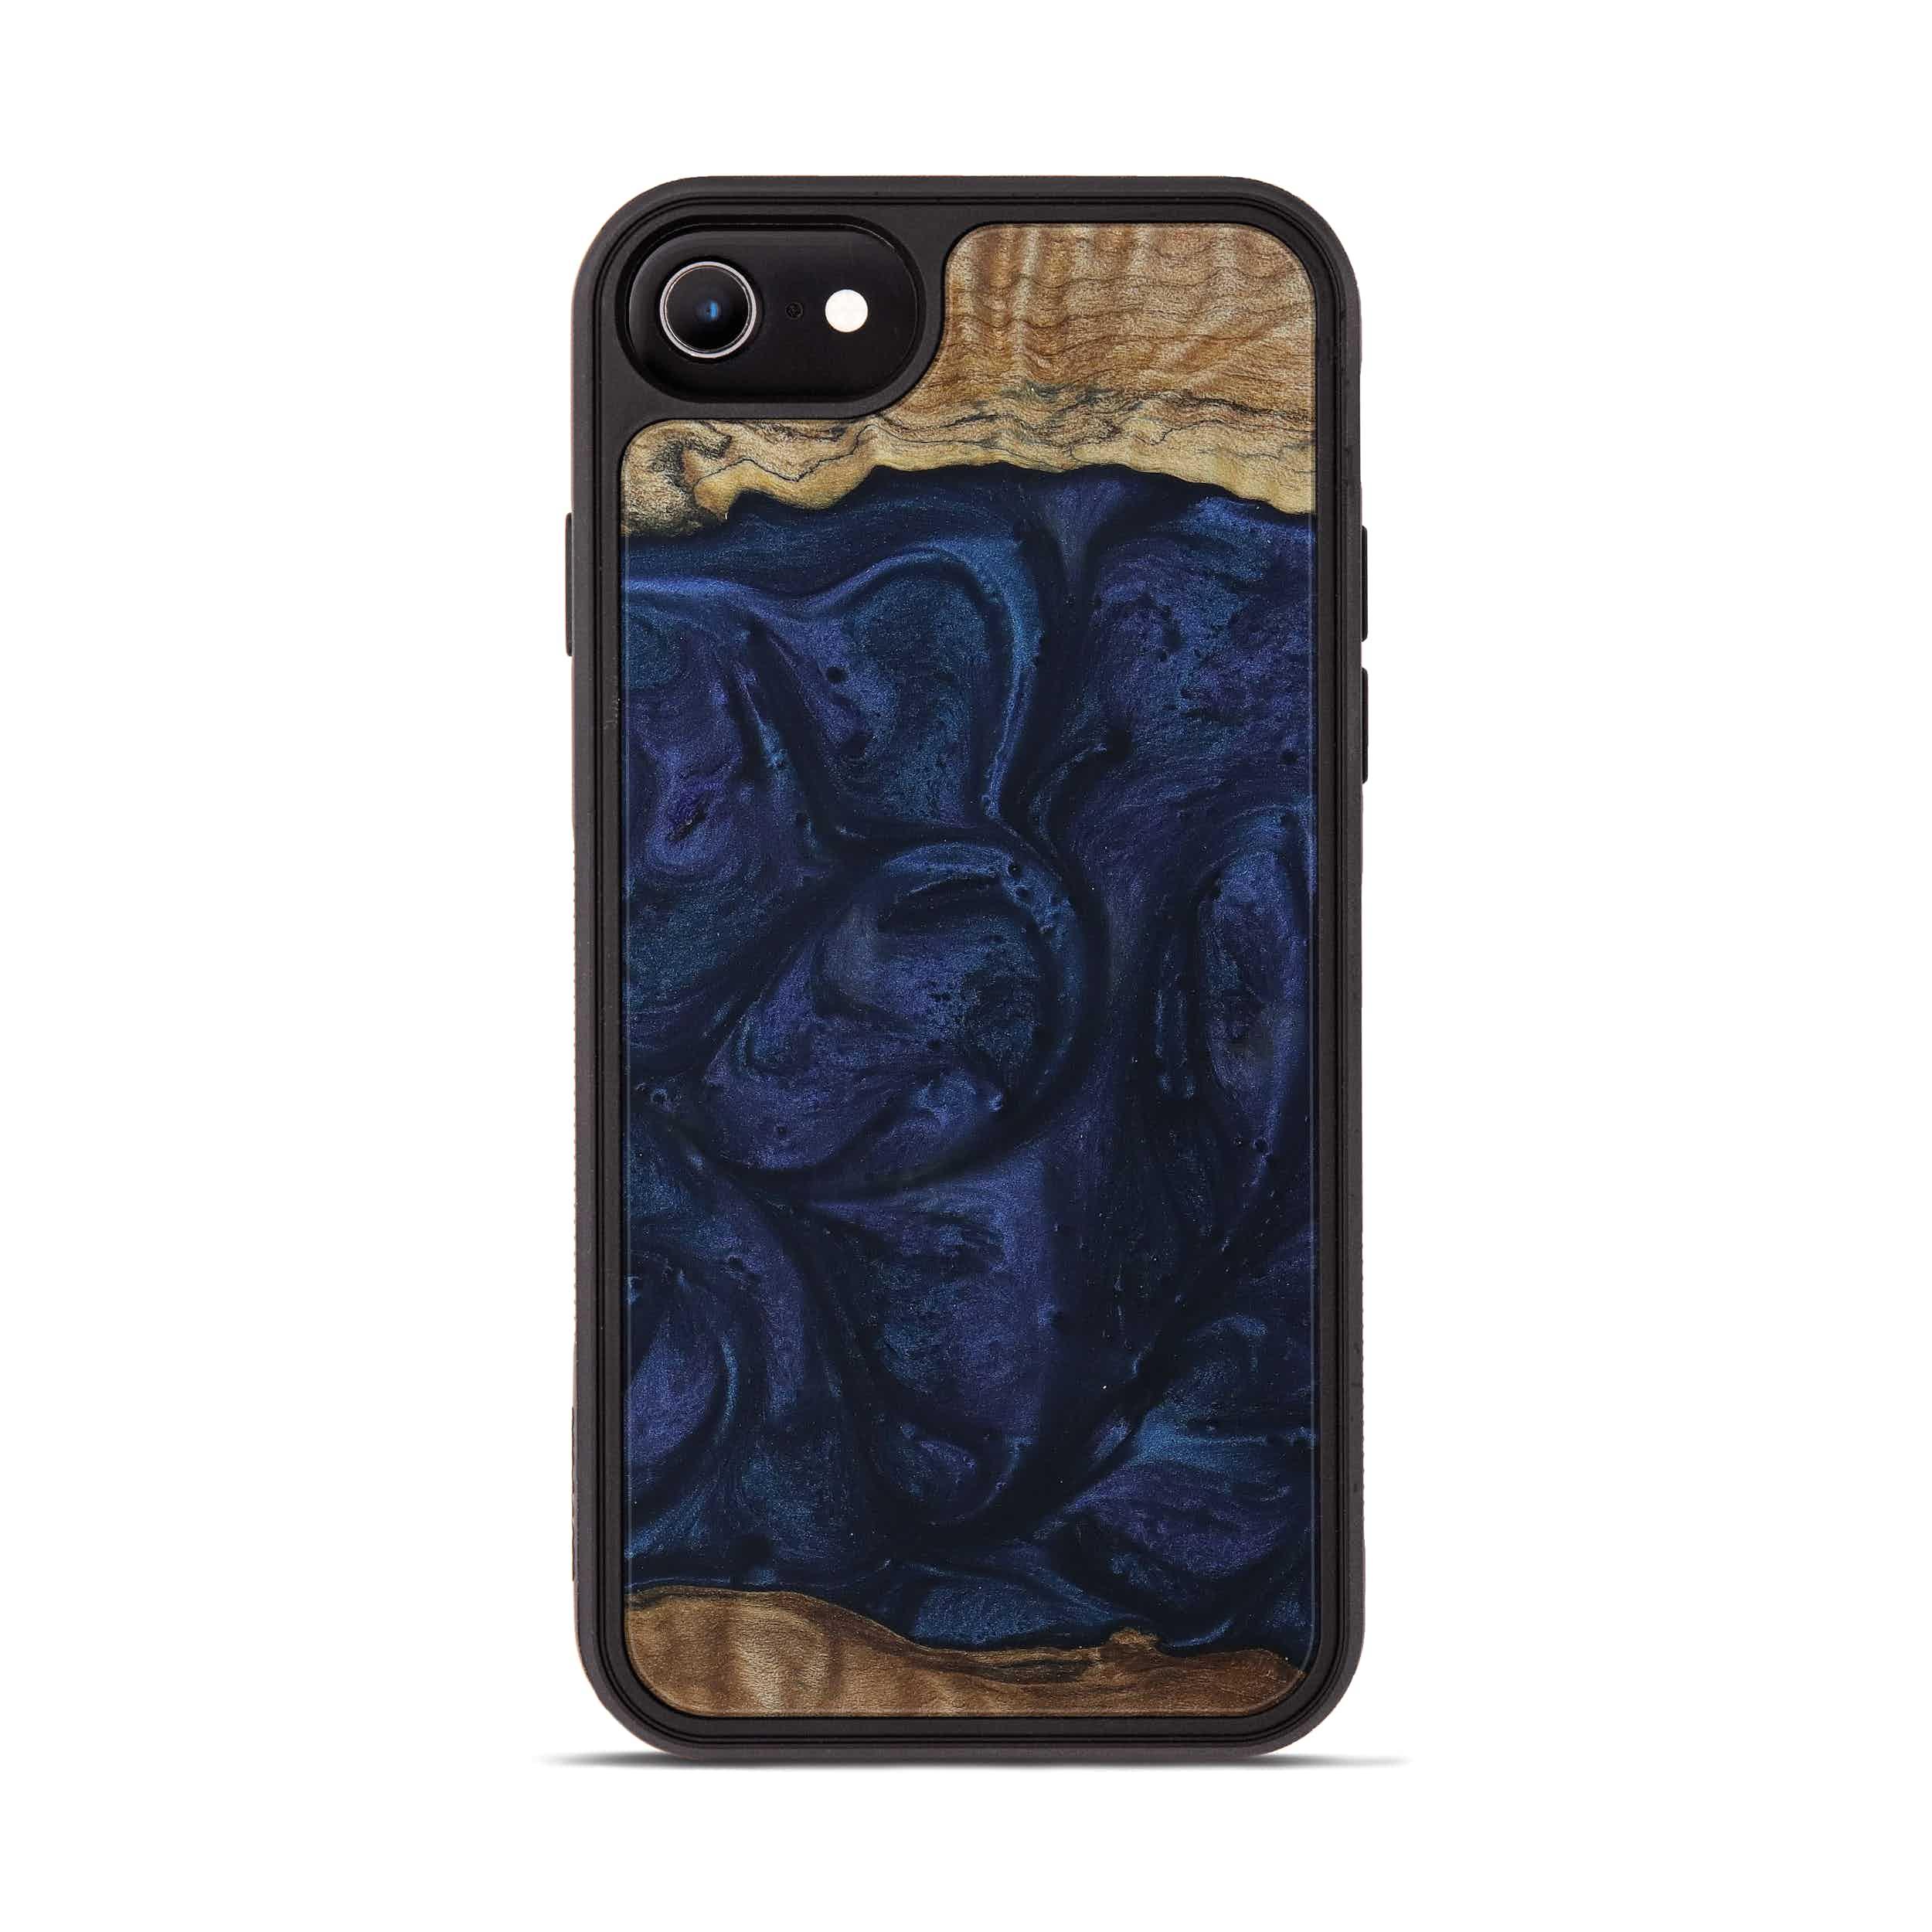 iPhone 7 Wood+Resin Phone Case - Xylia (Dark Blue, 399623)